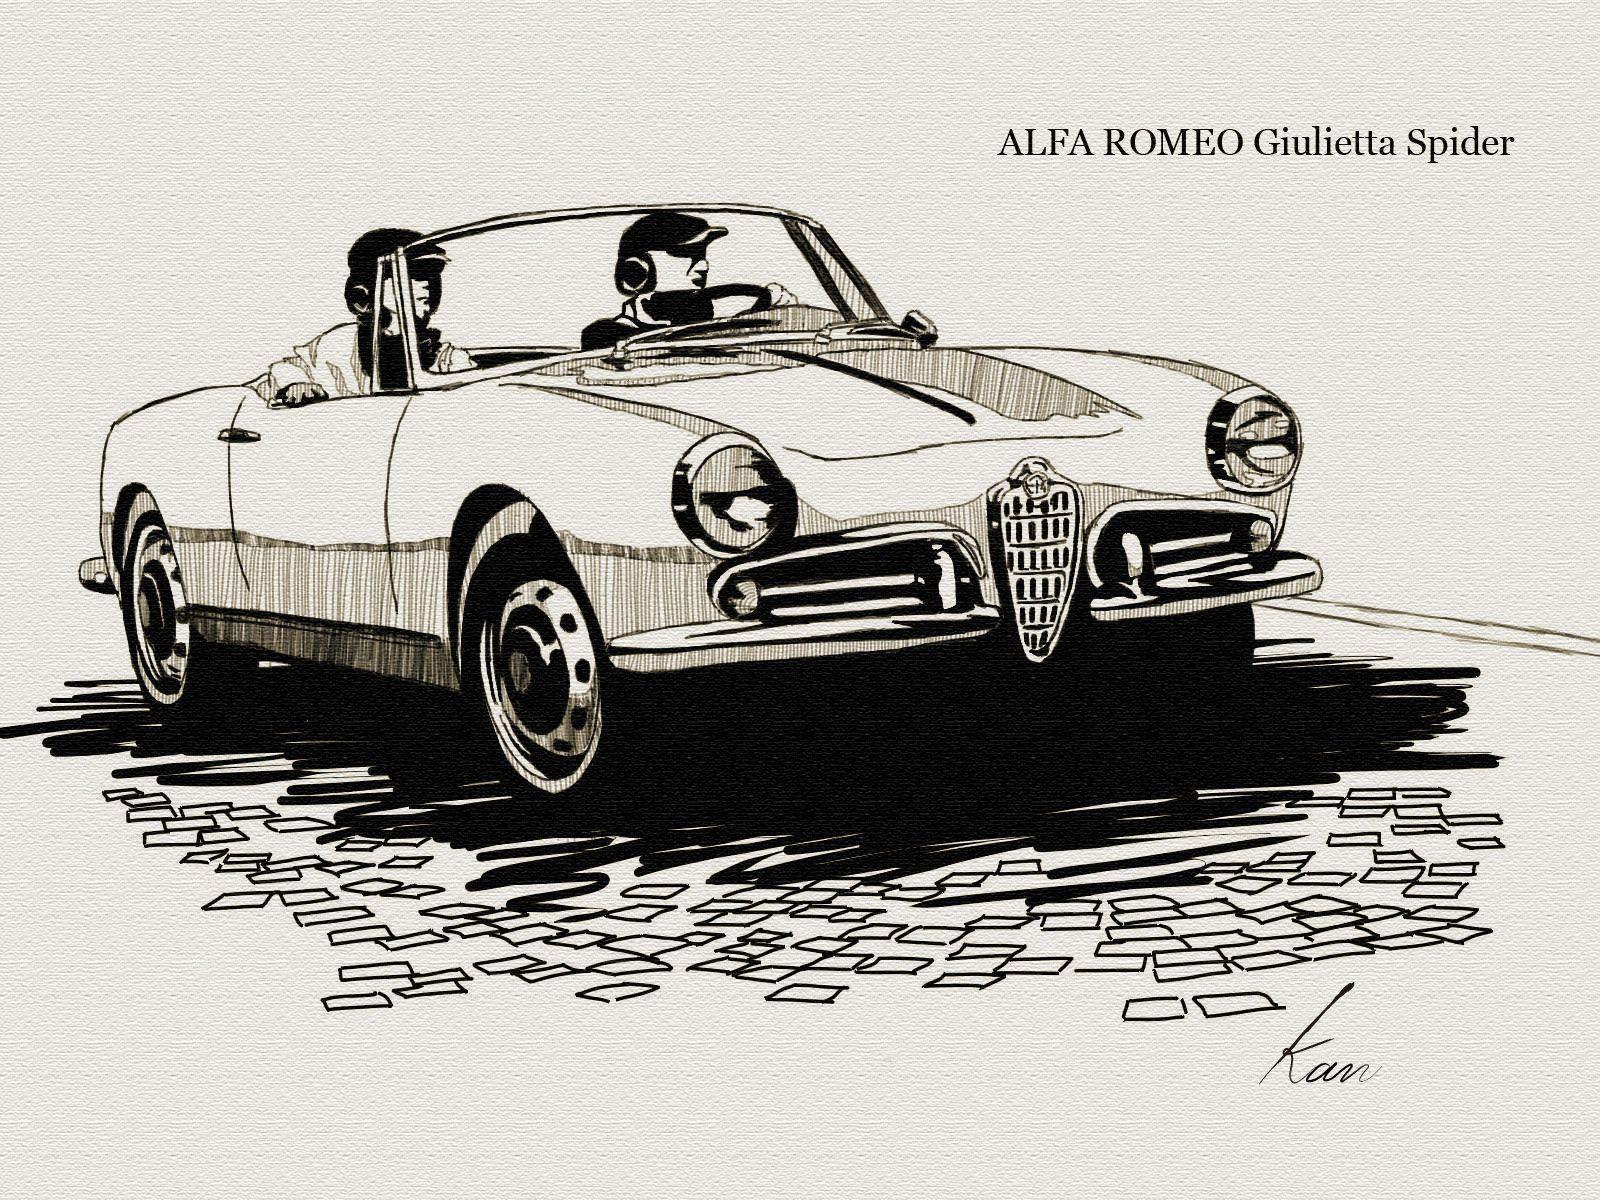 chasing classic cars alfa romeo #AlfaRomeoclassiccars